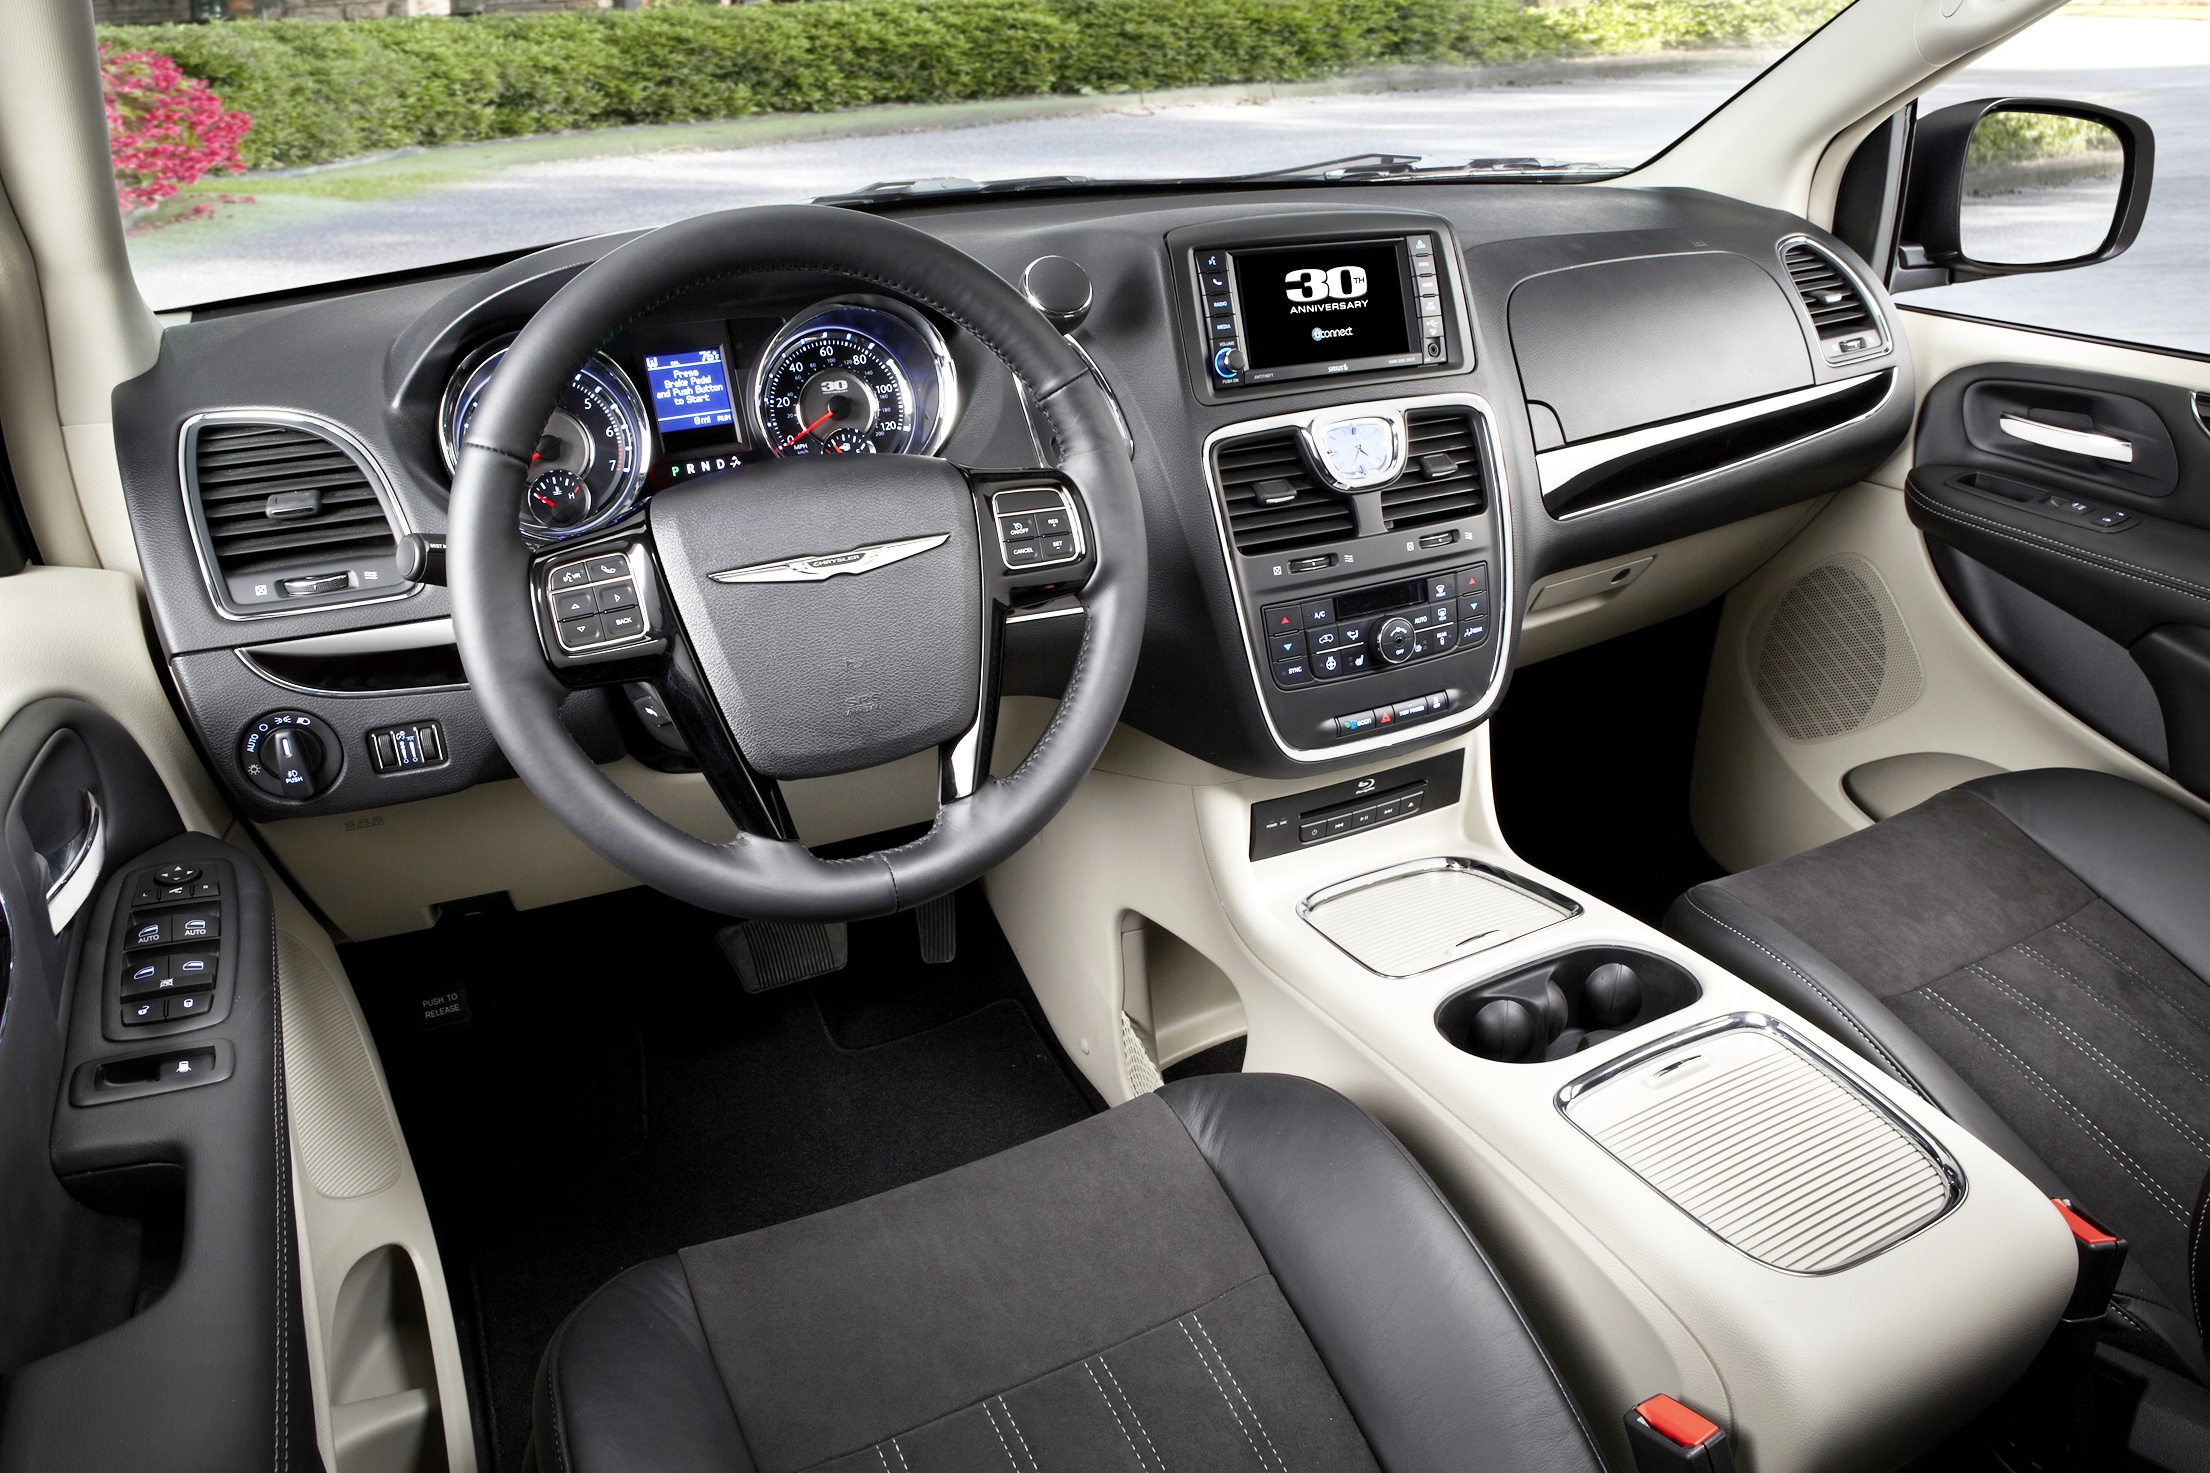 2014 Chrysler Town amp Country  Motor Trend